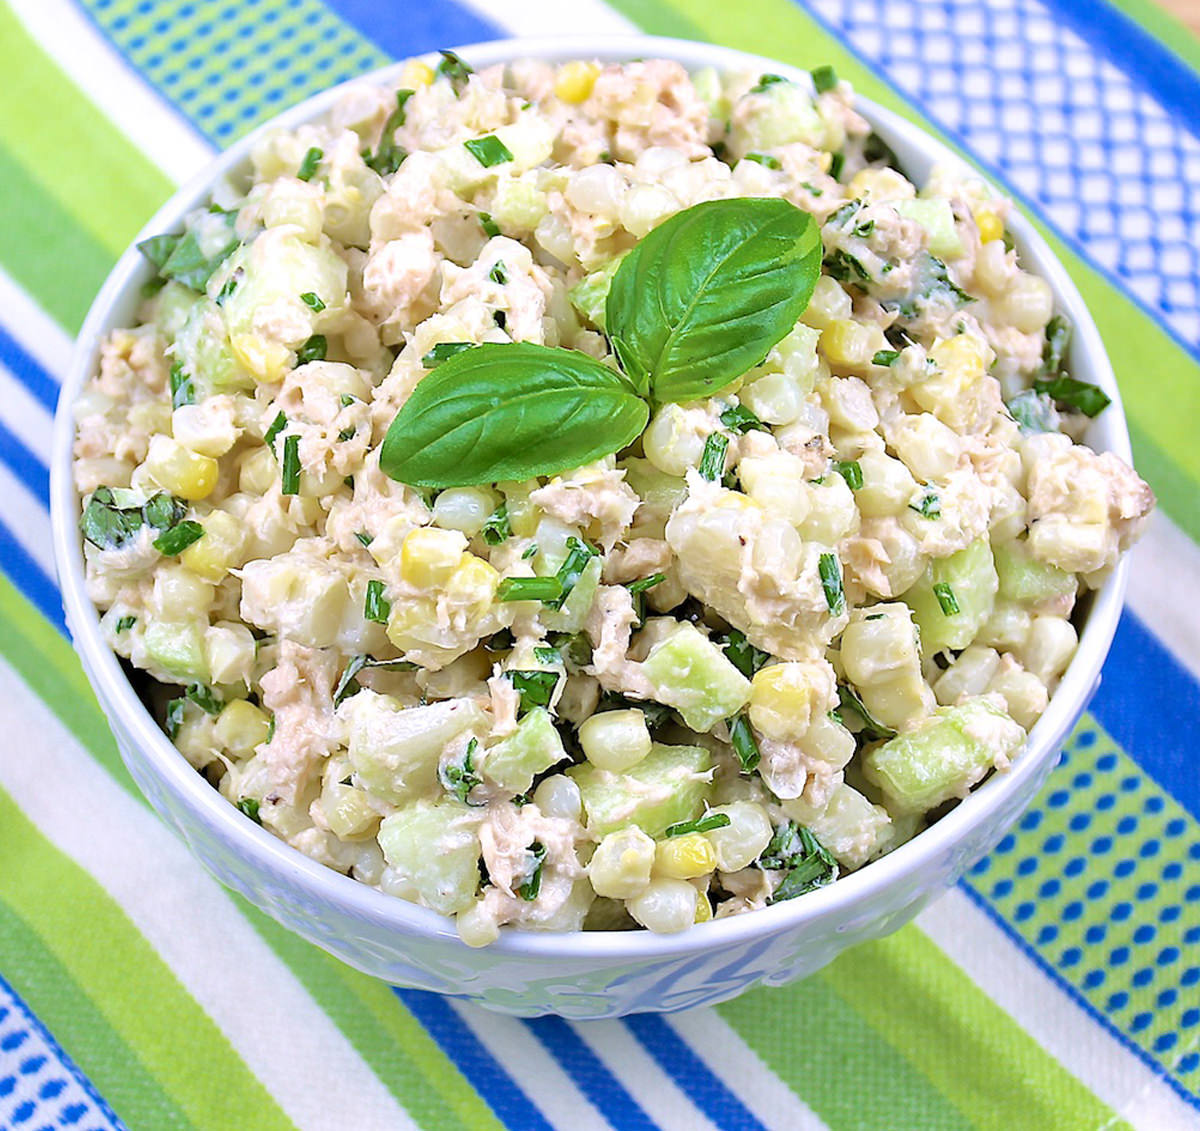 Salmon-Corn-and-Cucumber-Salad